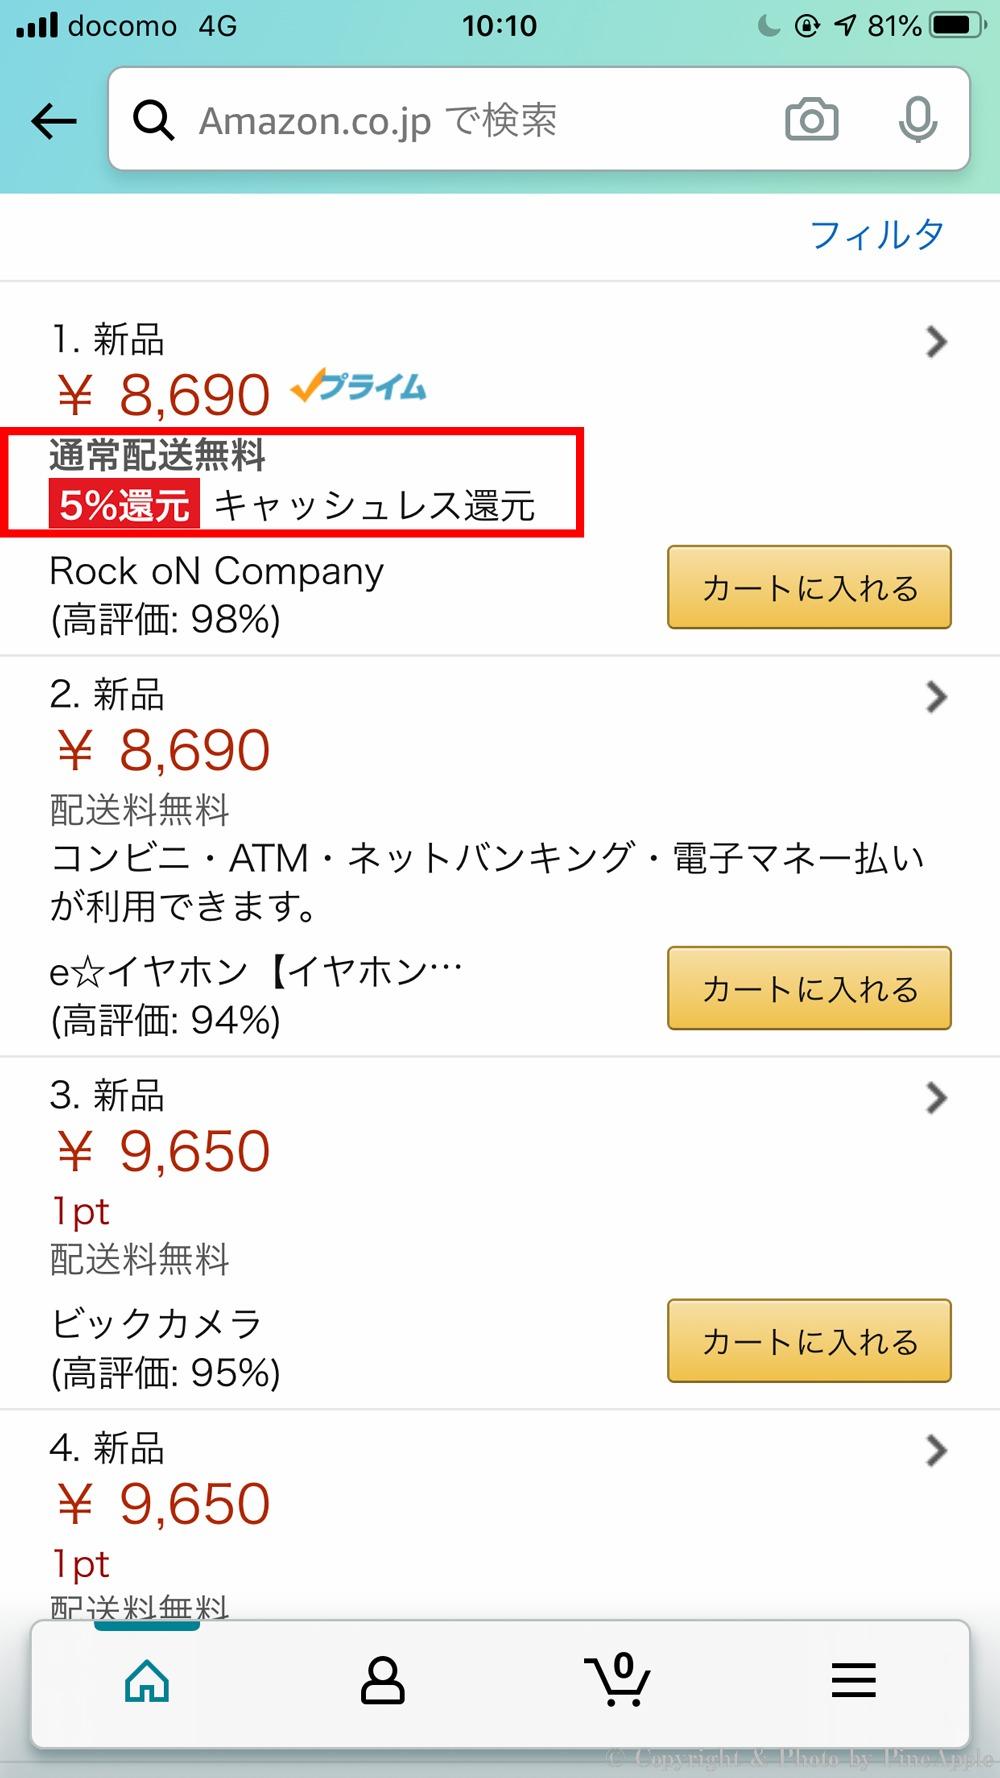 Amazon ショッピングアプリ:5 % キャッシュレス還元